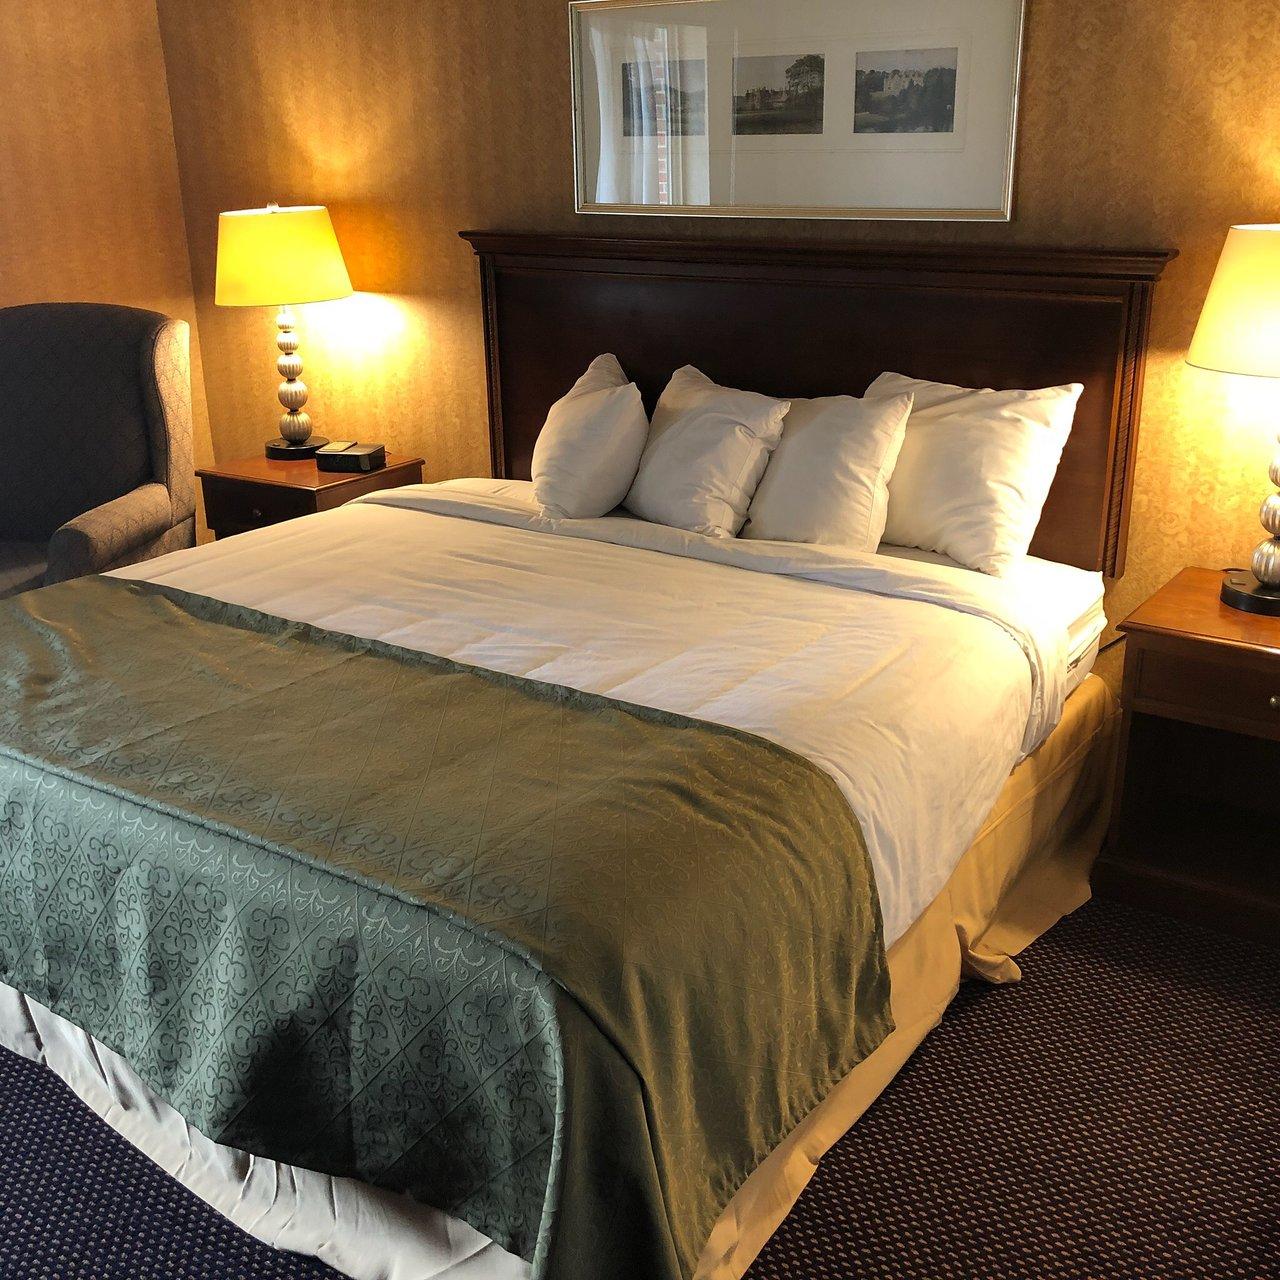 TRAVELODGE BY WYNDHAM WATERTOWN - Updated 2018 Prices & Hotel ...